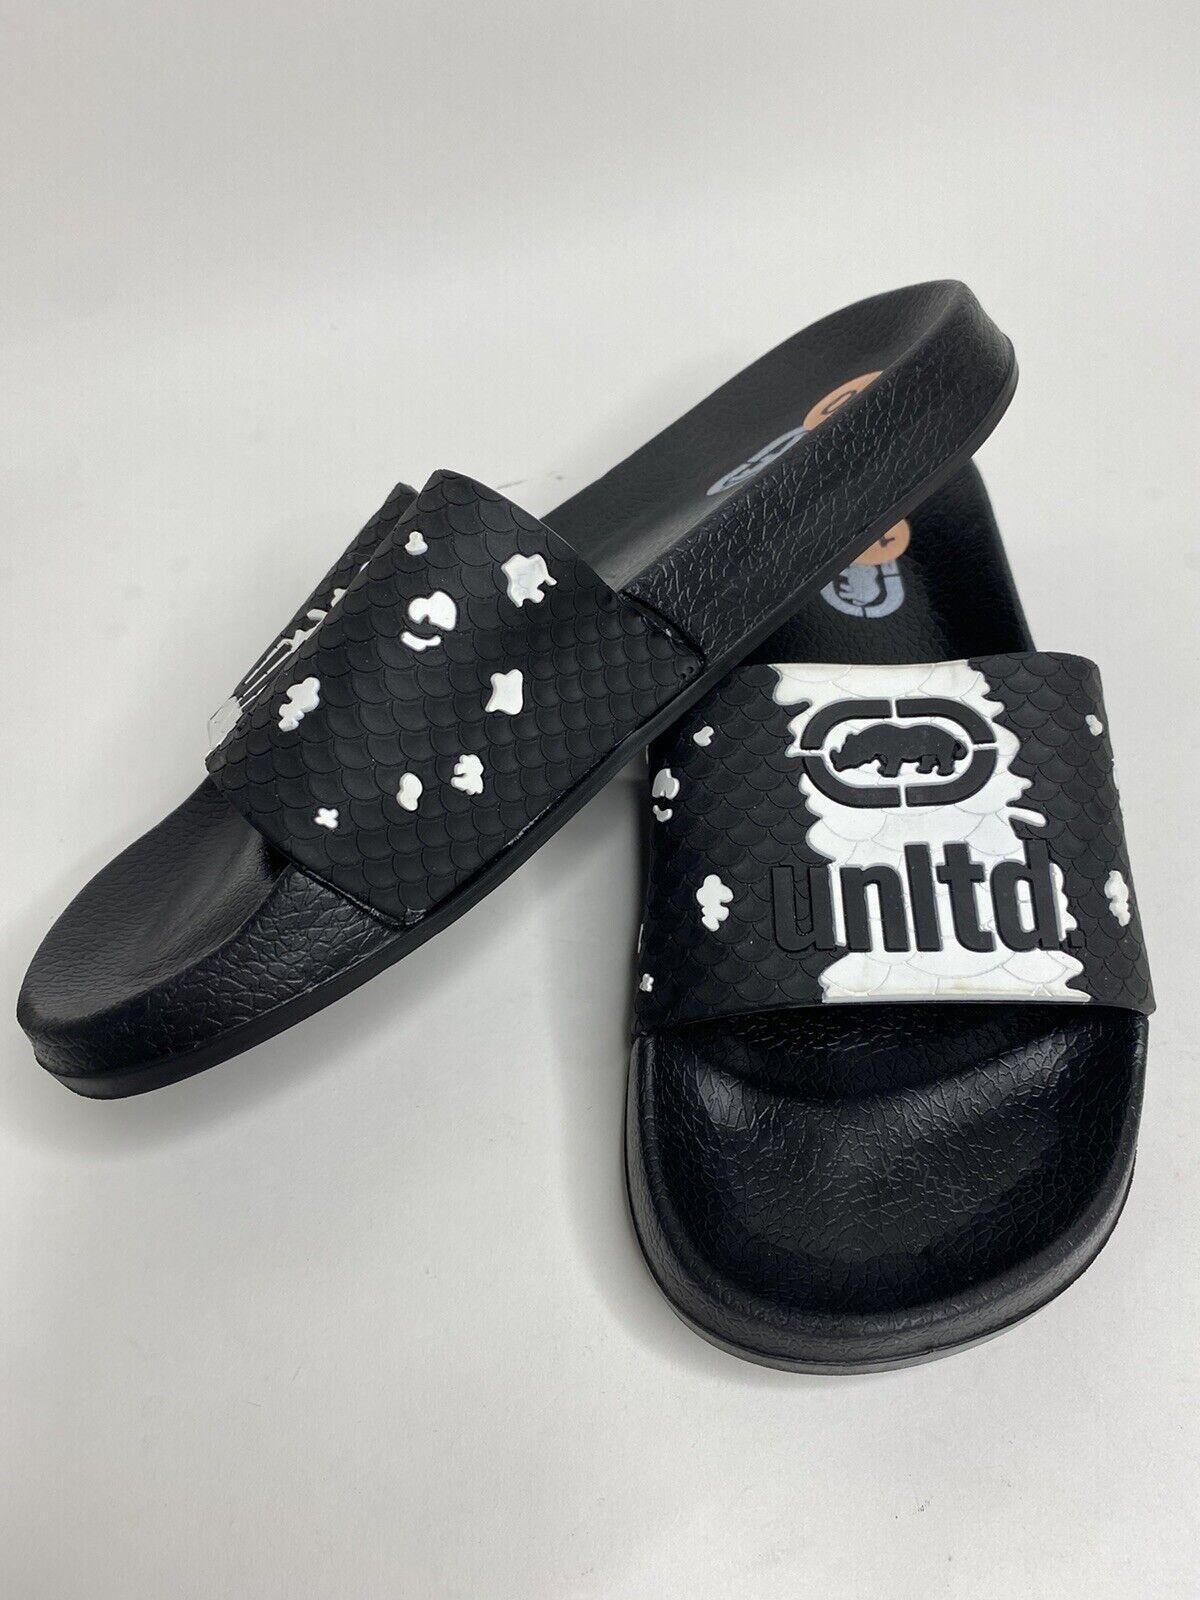 Men's Ecko Unltd Black Rubber Slides Sandals •Size 10 *NWOB